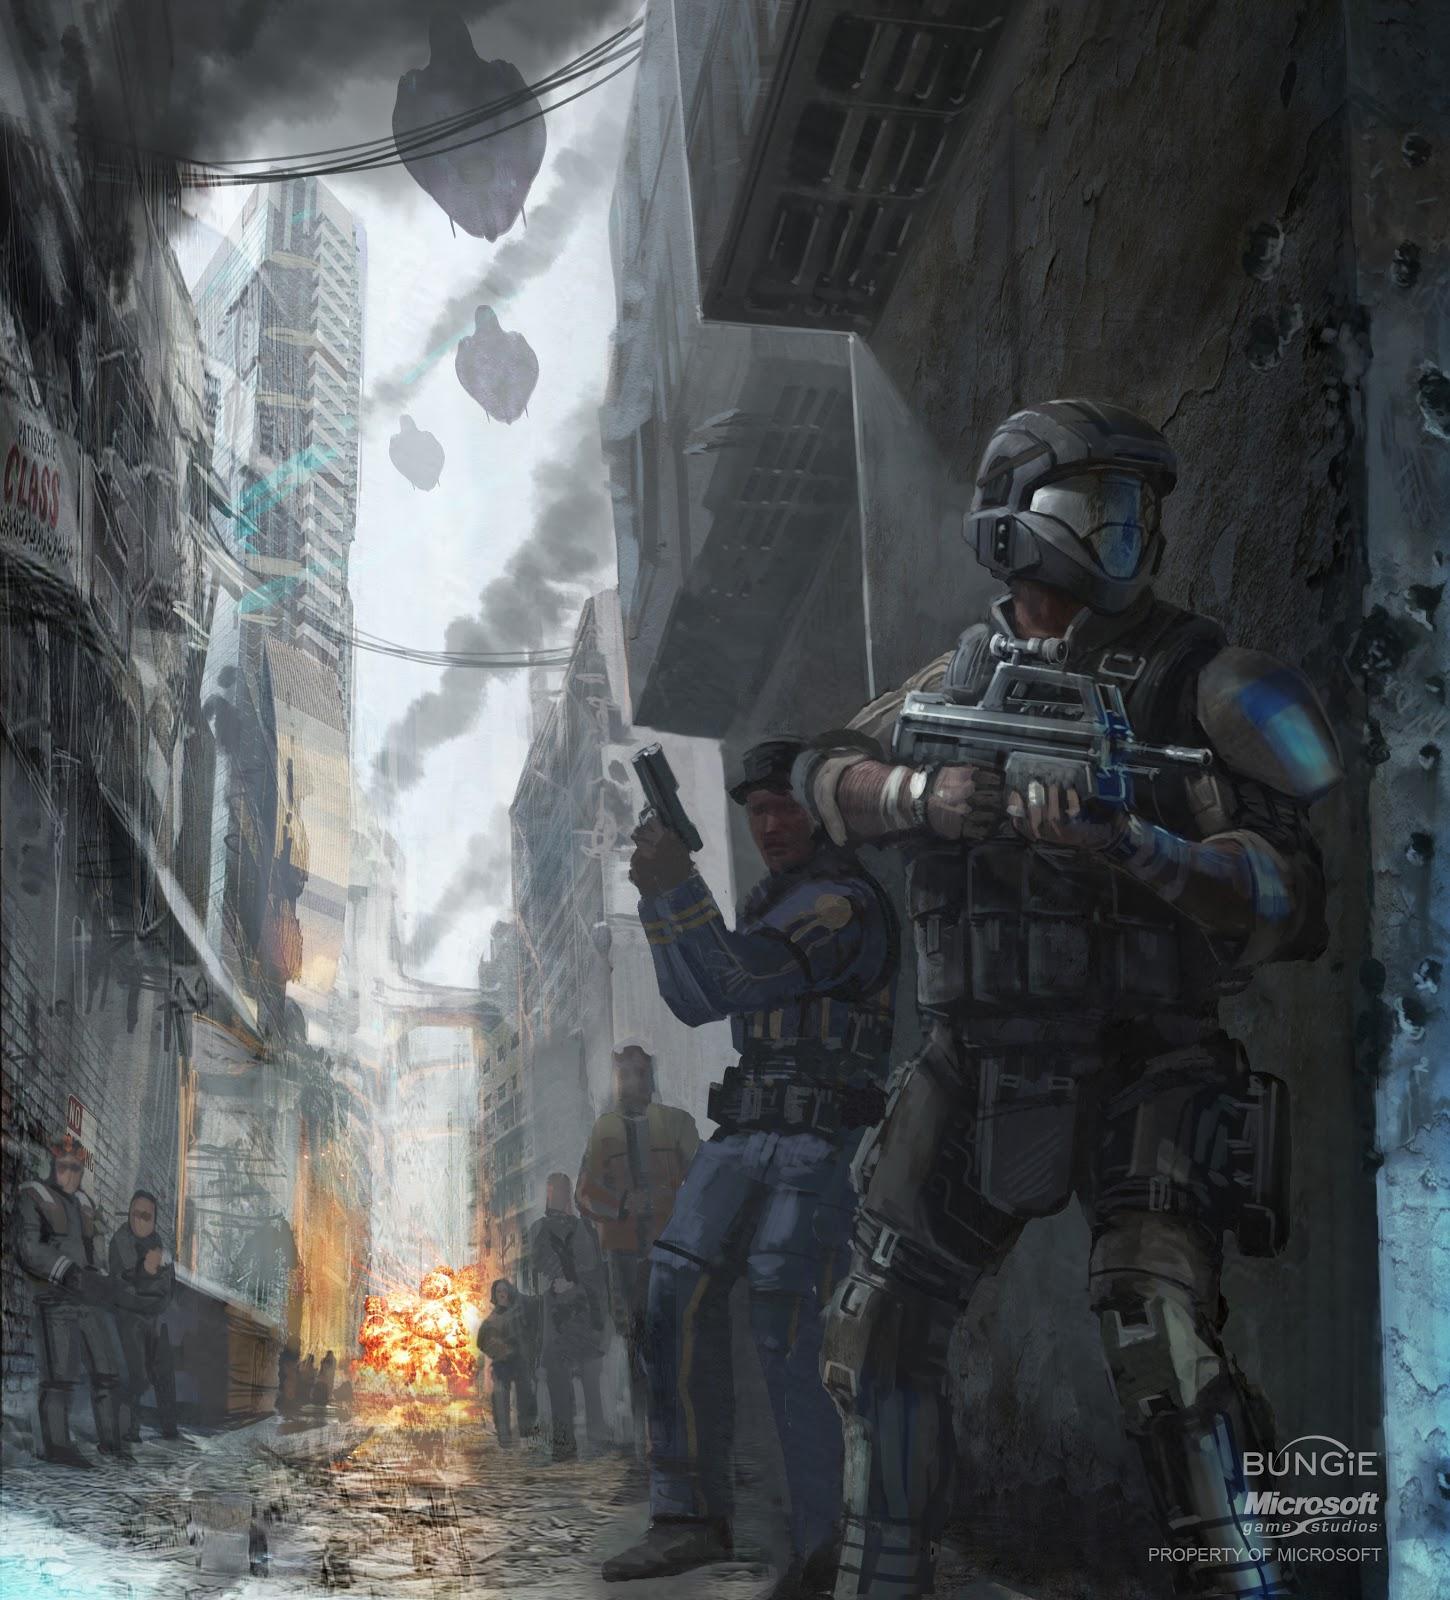 Halo Live Wallpaper: Art: Halo 3 Concept Art (update) 1/22/10